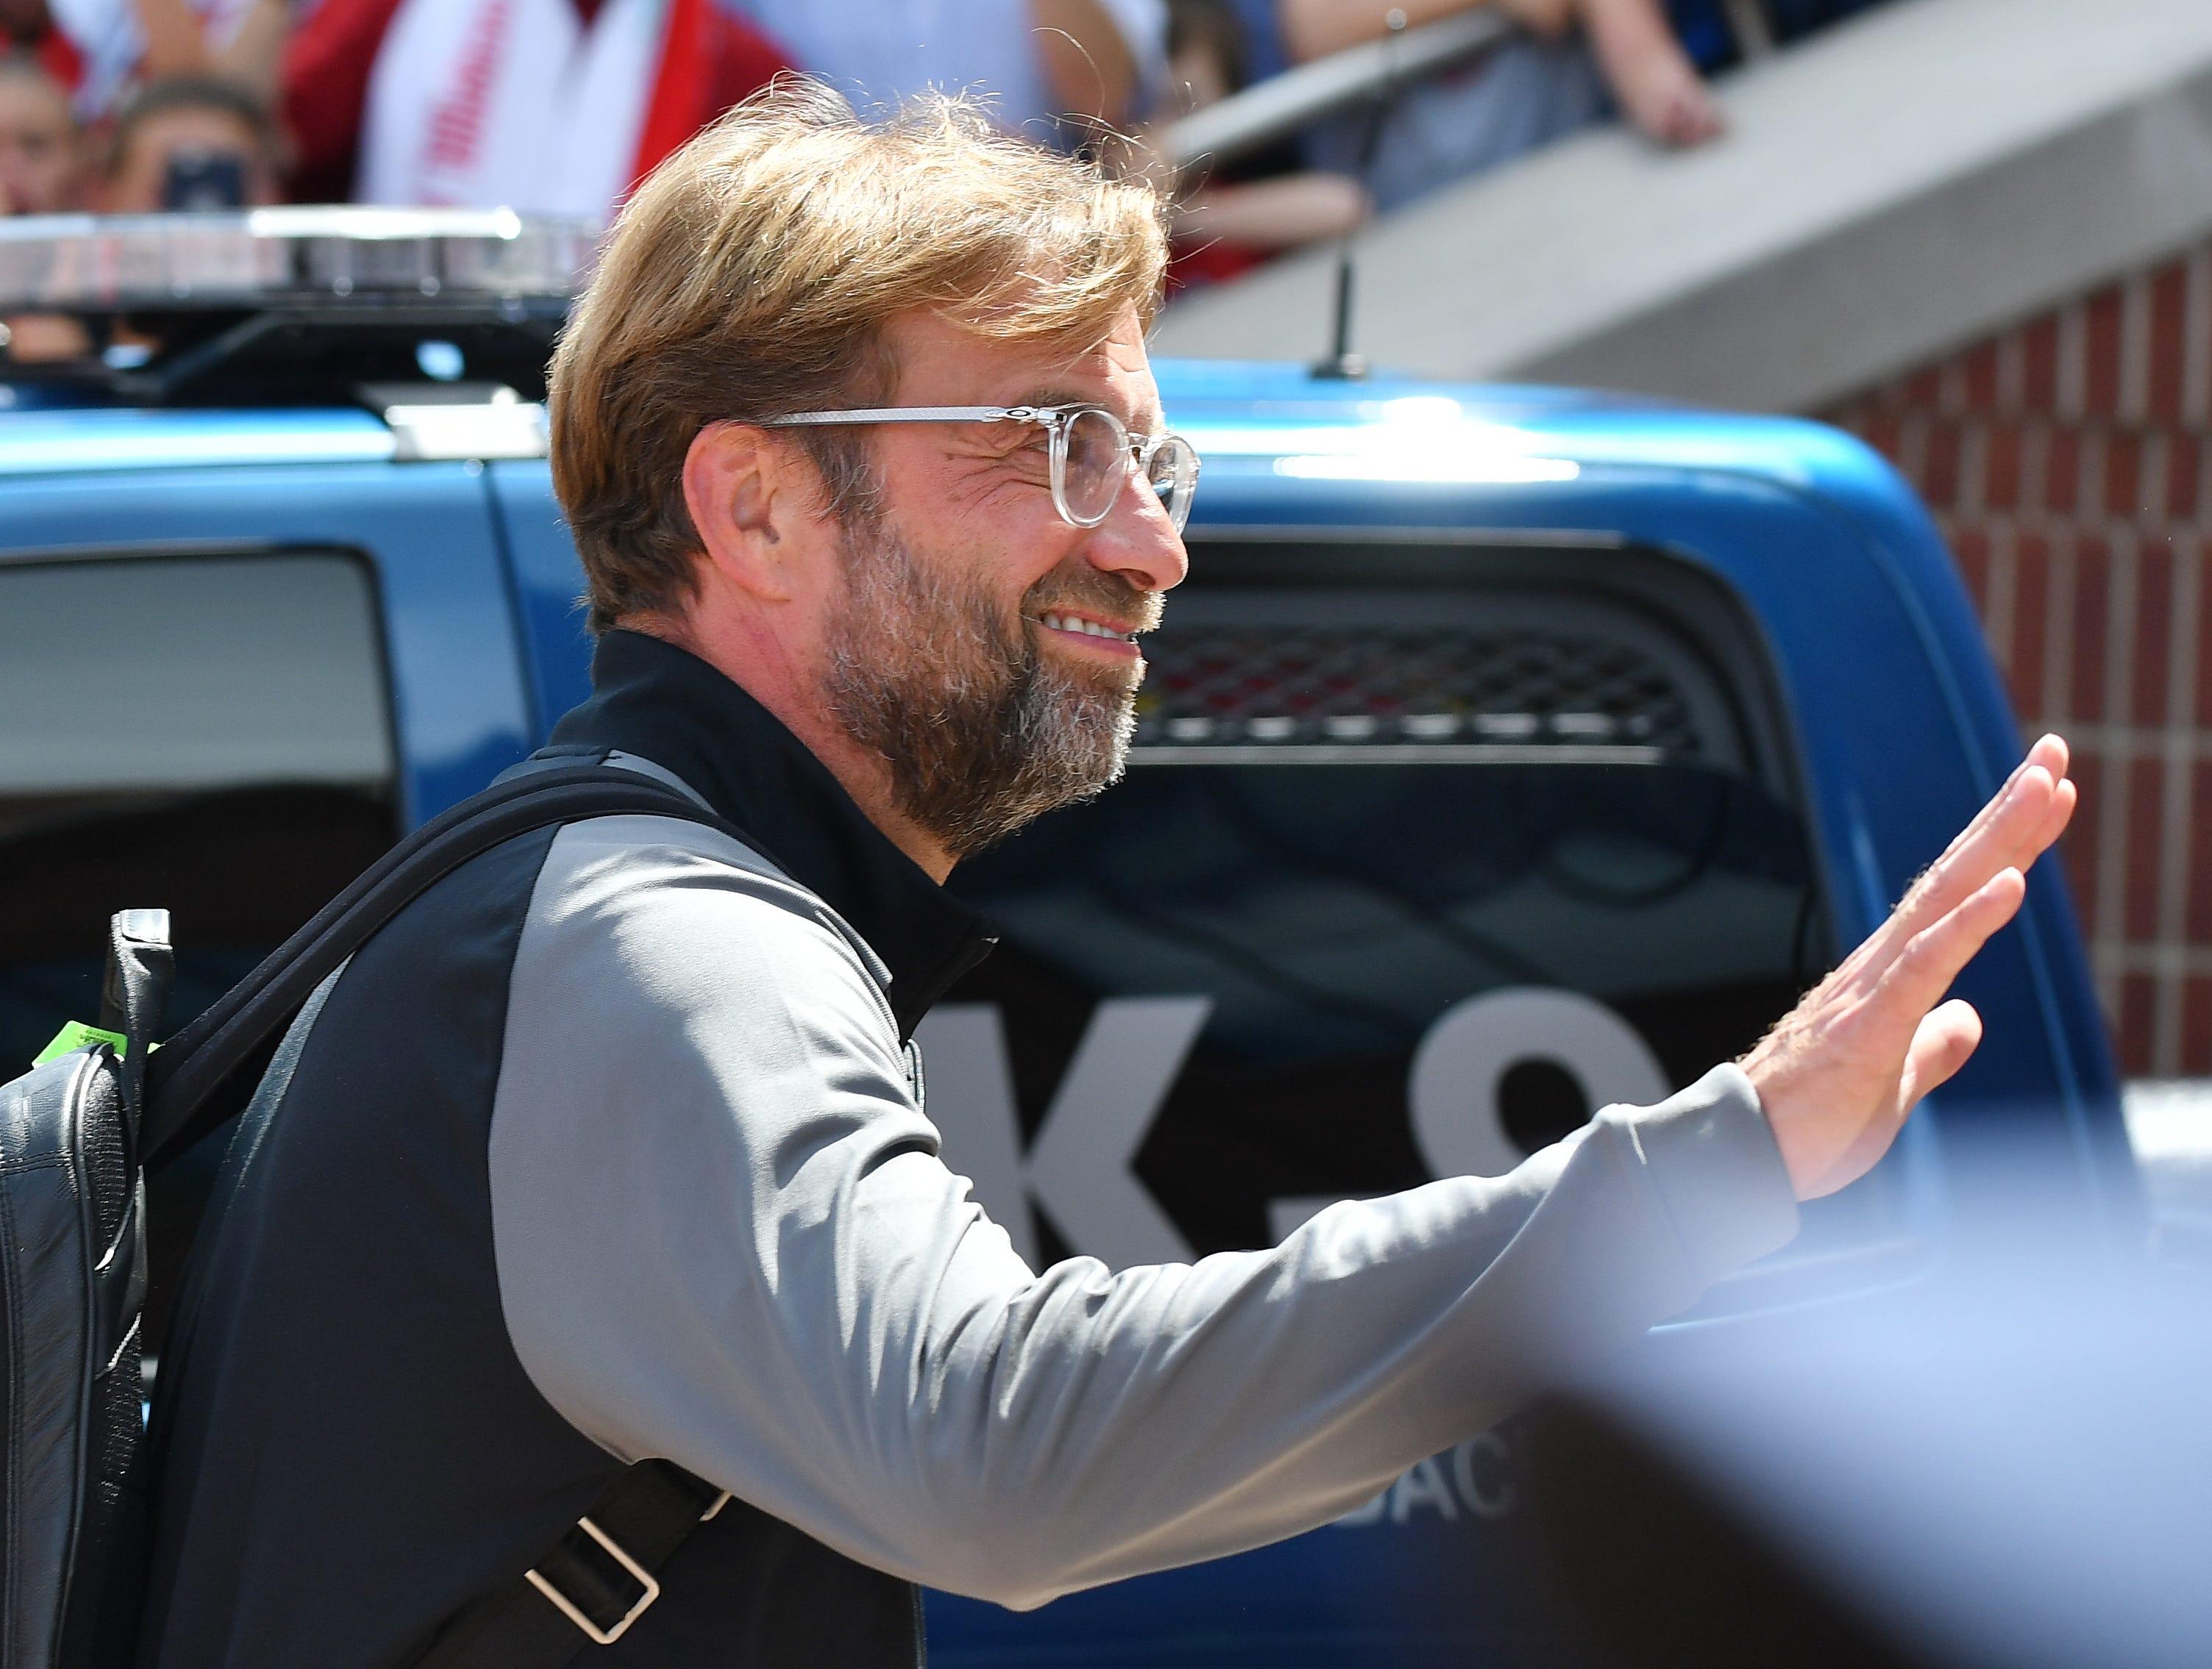 Liverpool head coach Jurgen Klopp arrives to the stadium.